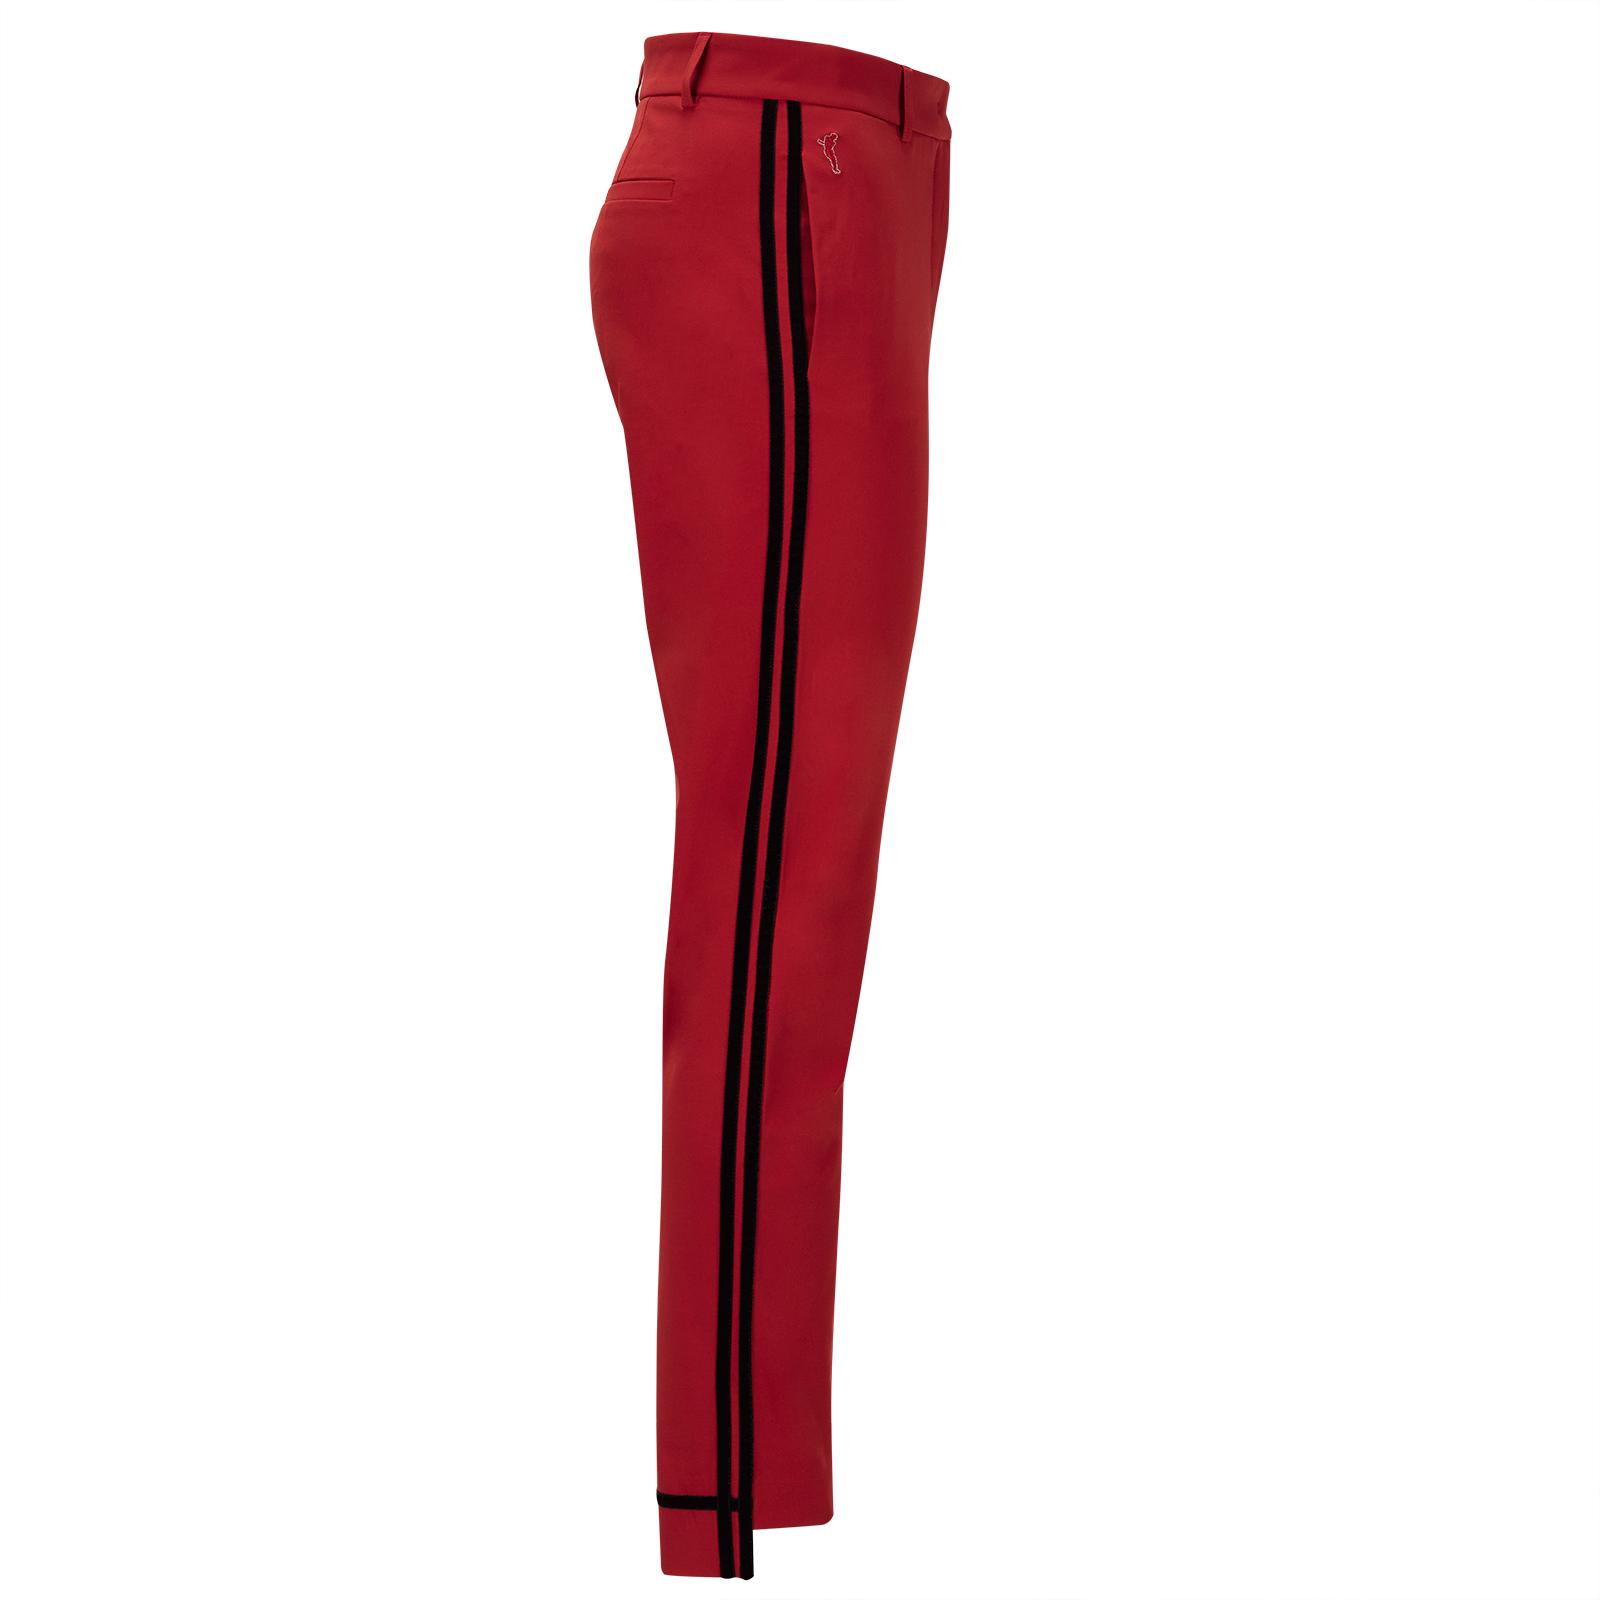 Damen 7/8 Slim-Fit Stretch-Golfhose aus exklusivem Cotton Blend